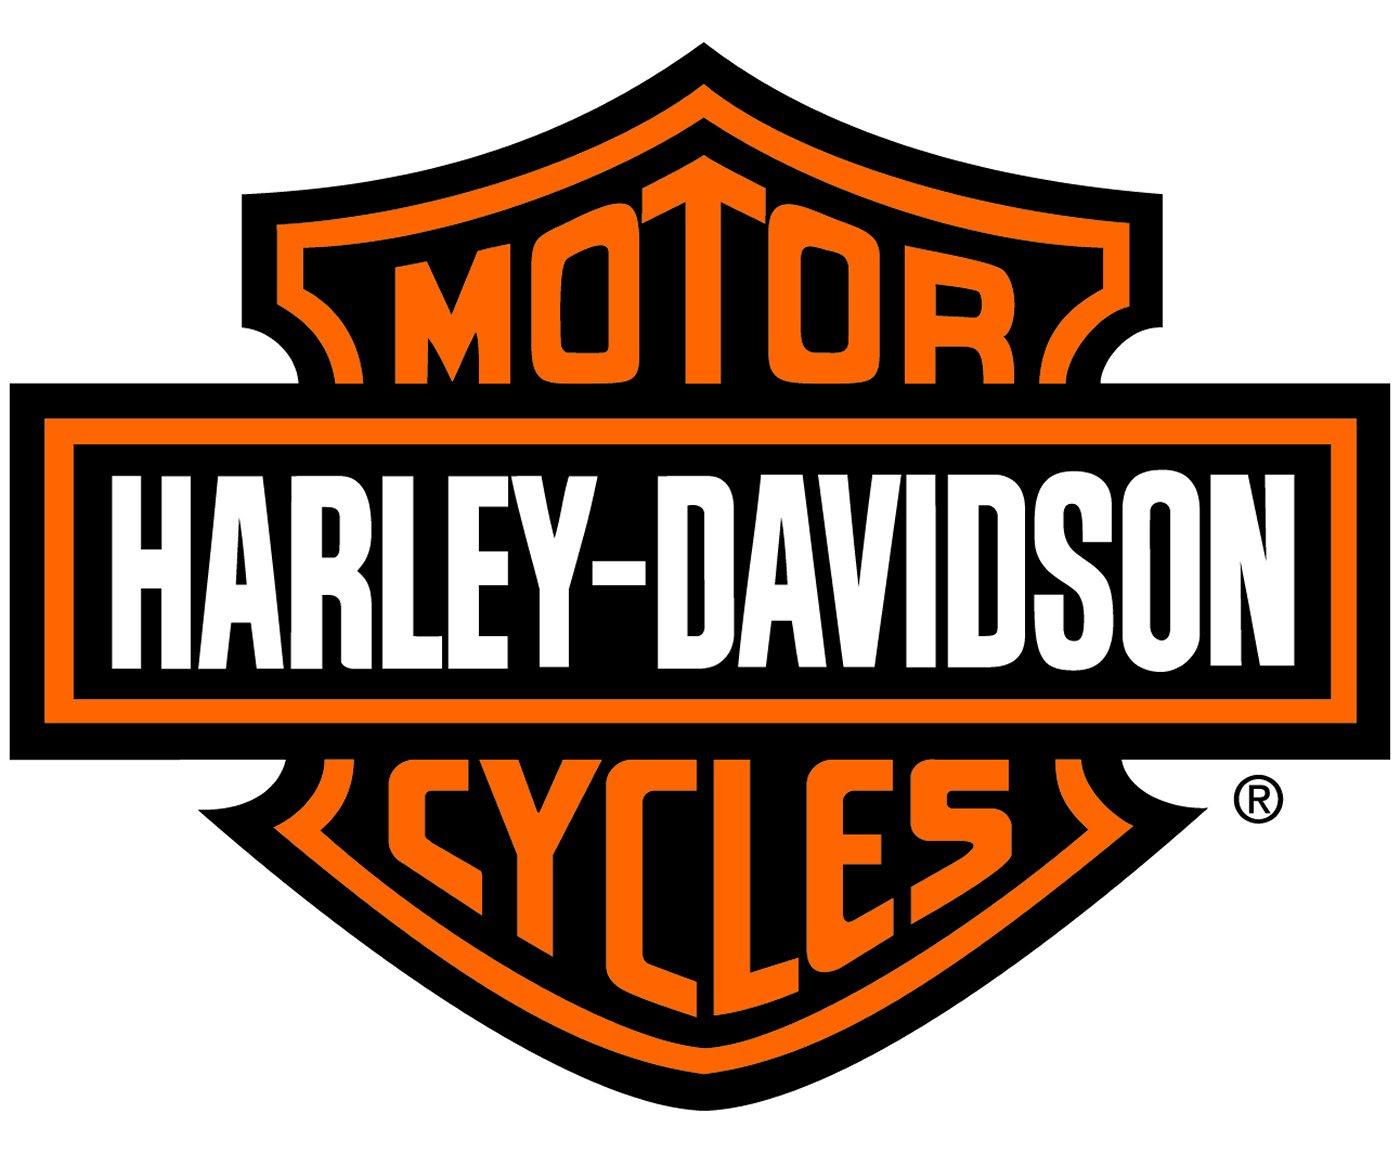 http://www.harleydavidson.com